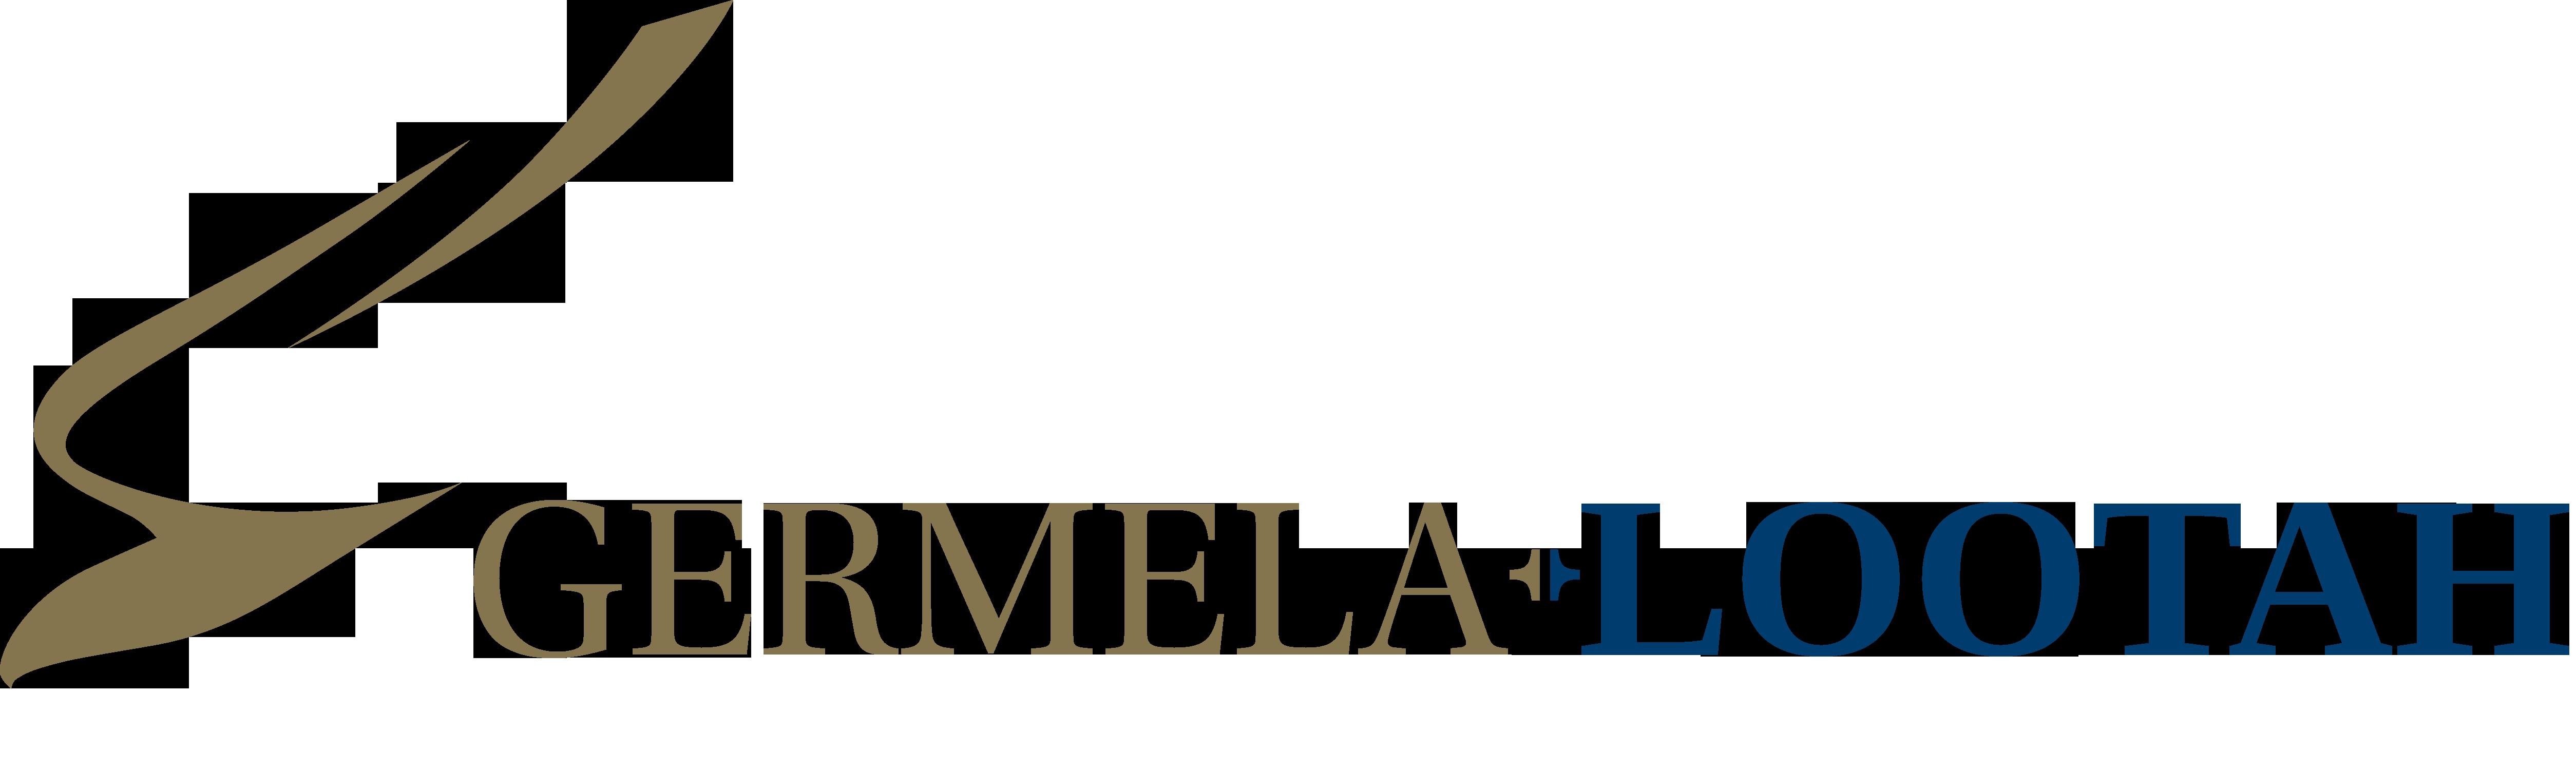 Germela-Lootah Logo